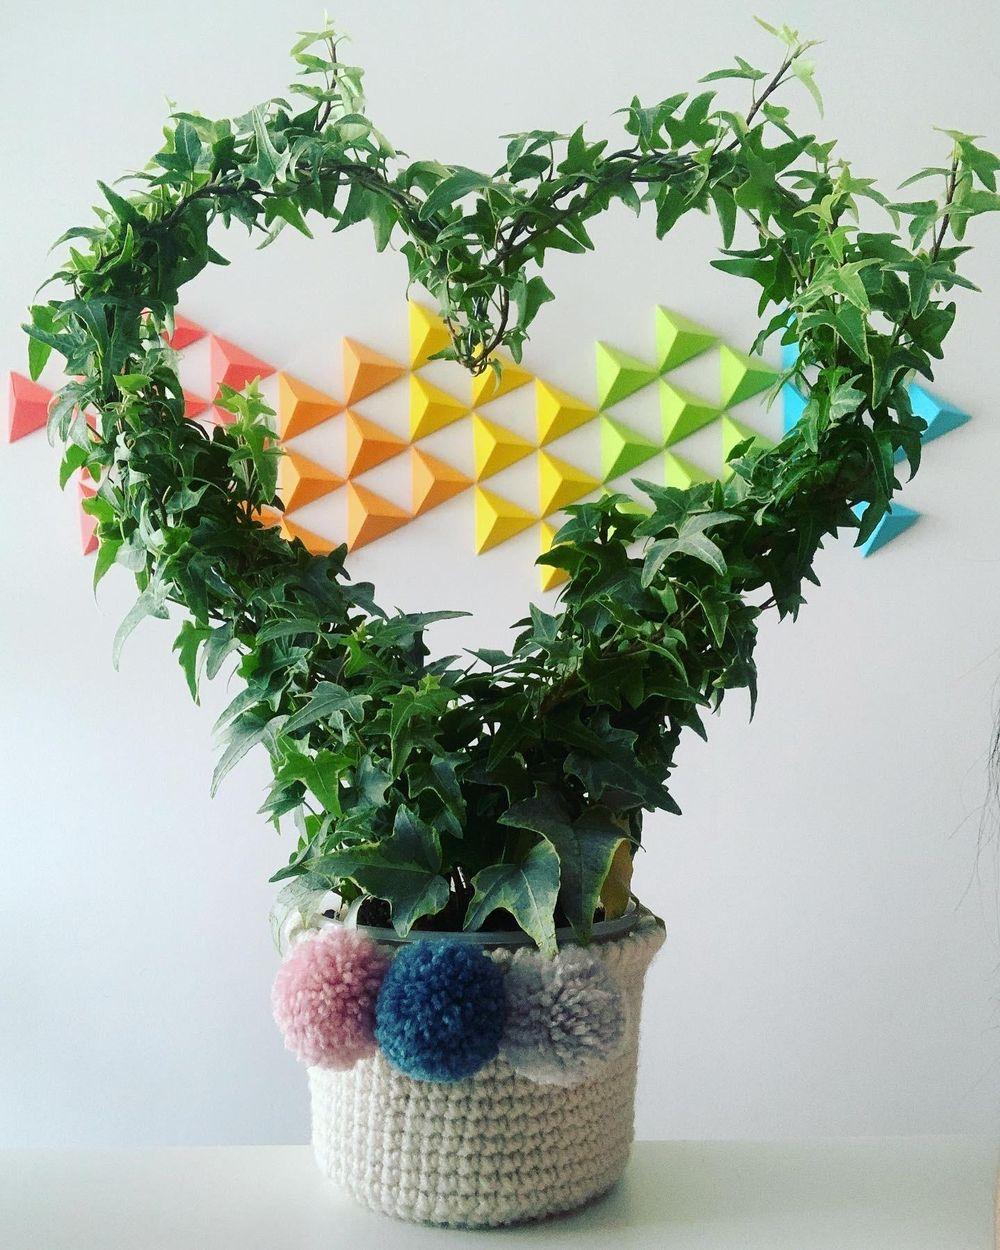 Crochet a plant pot - image 1 - student project